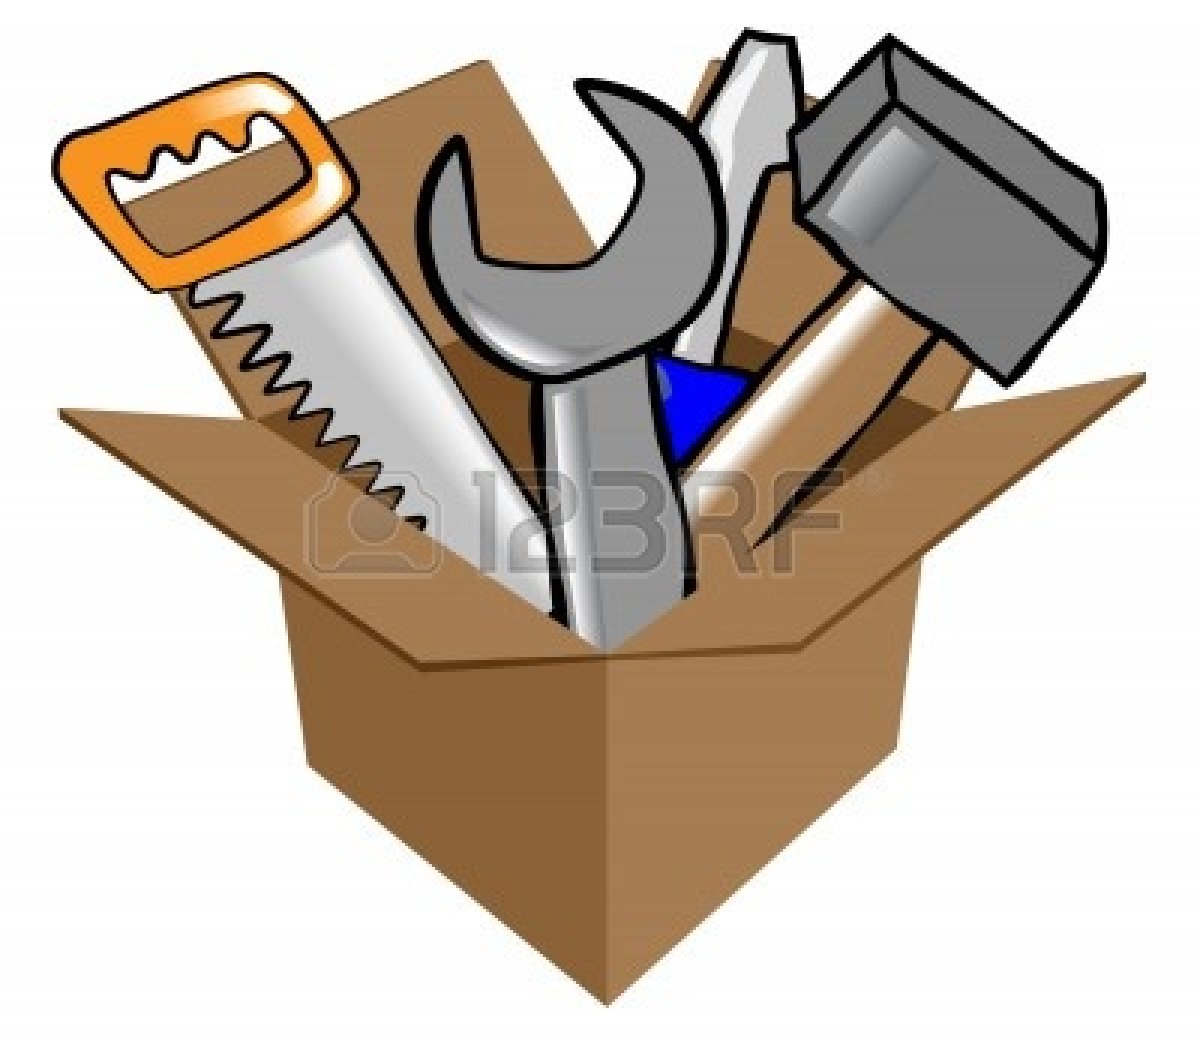 Carpentry clipart carpenter tool. Tools clip art www